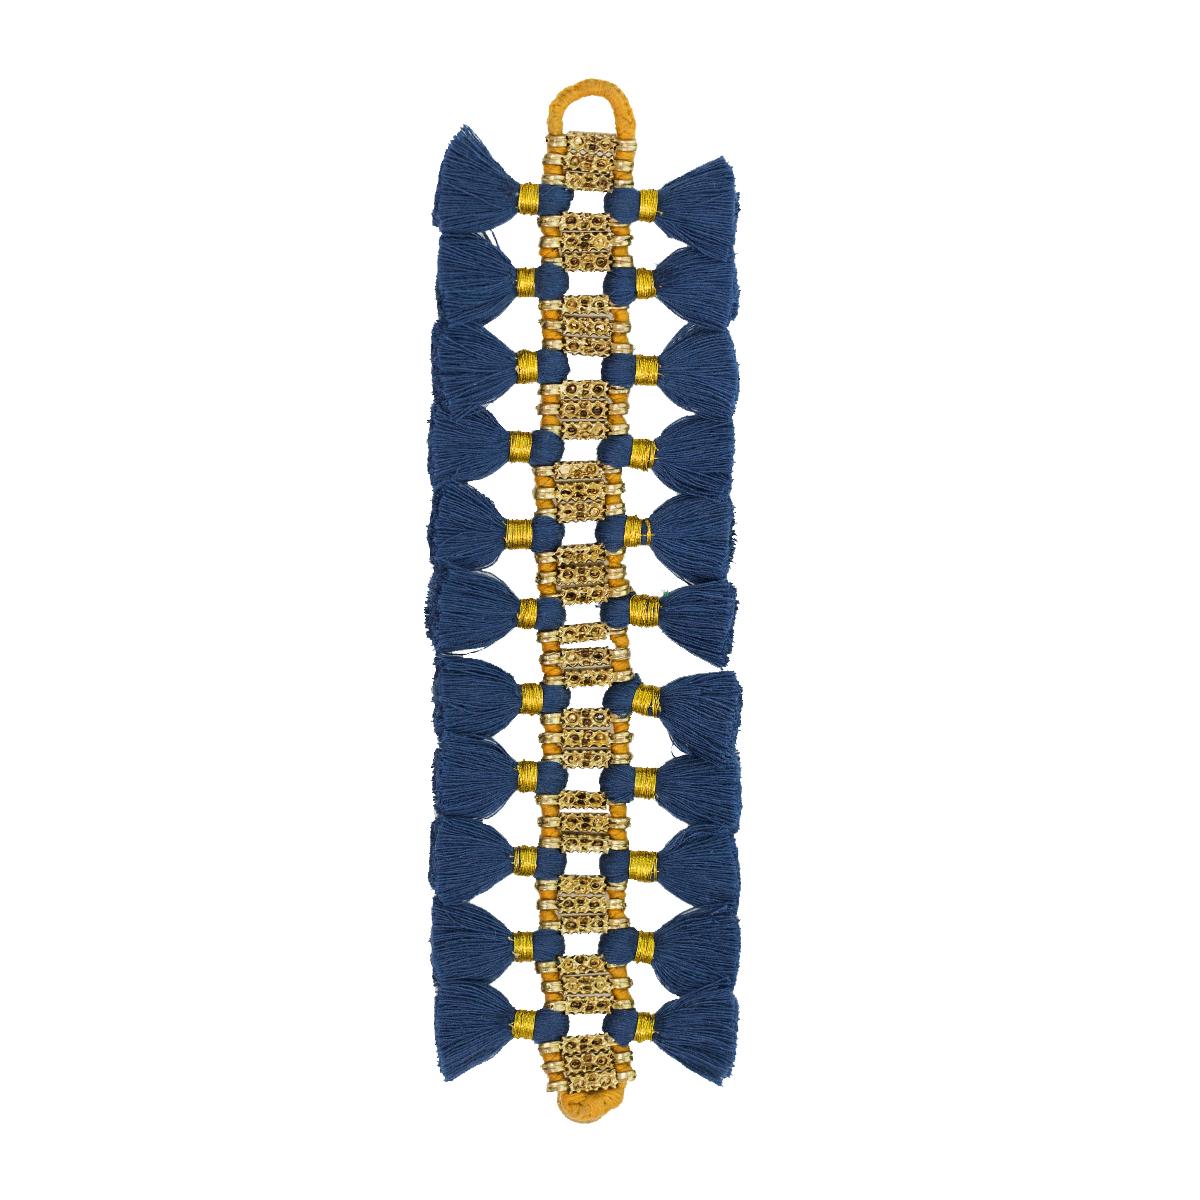 Bohemian Fashion Double Tassel Bracelet - Blue & Gold